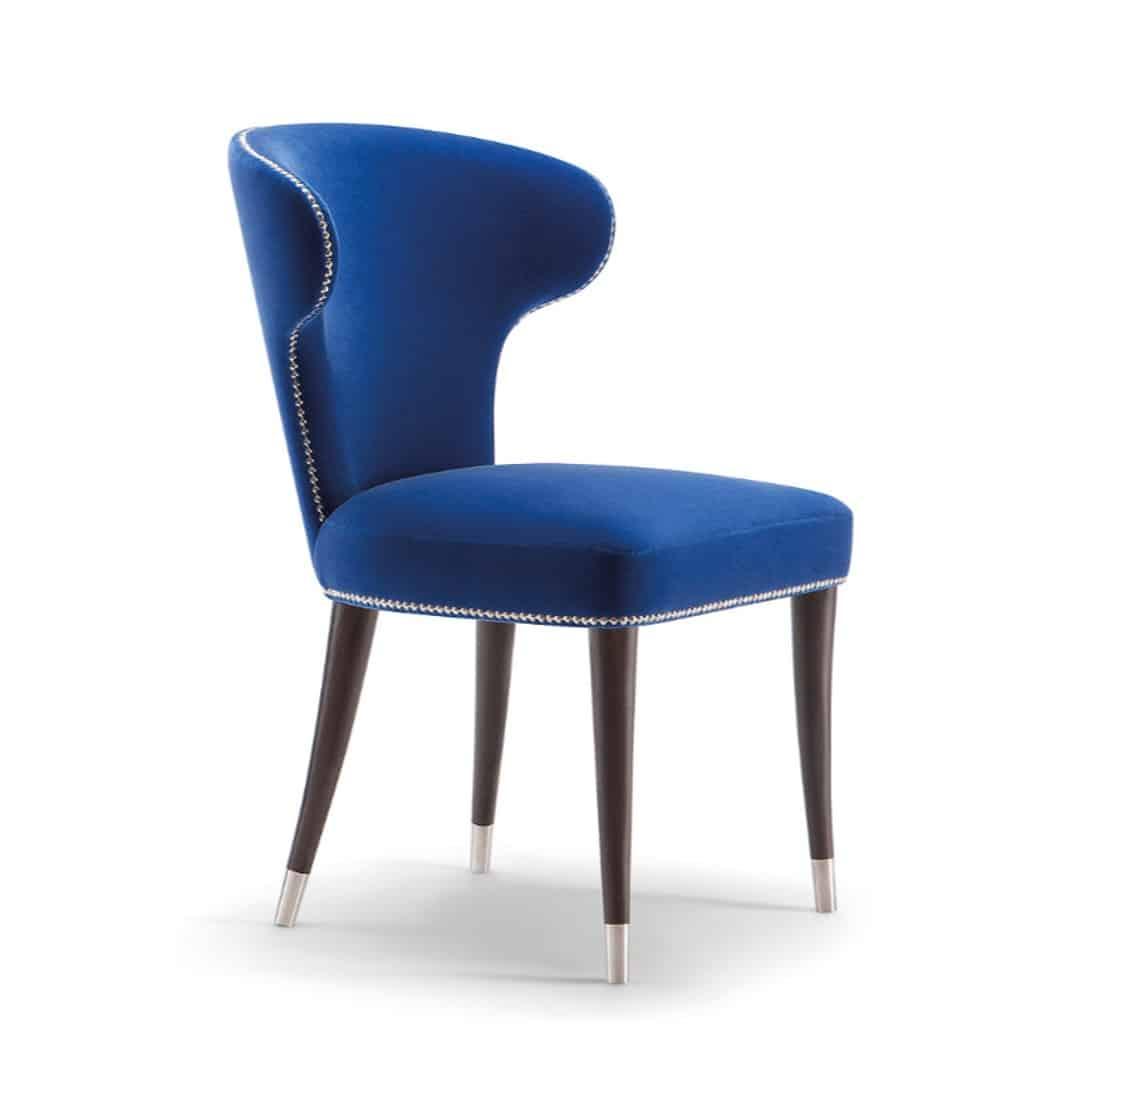 Carmel Side Chair Camelia Tirolo DeFrae Contract Furniture Side